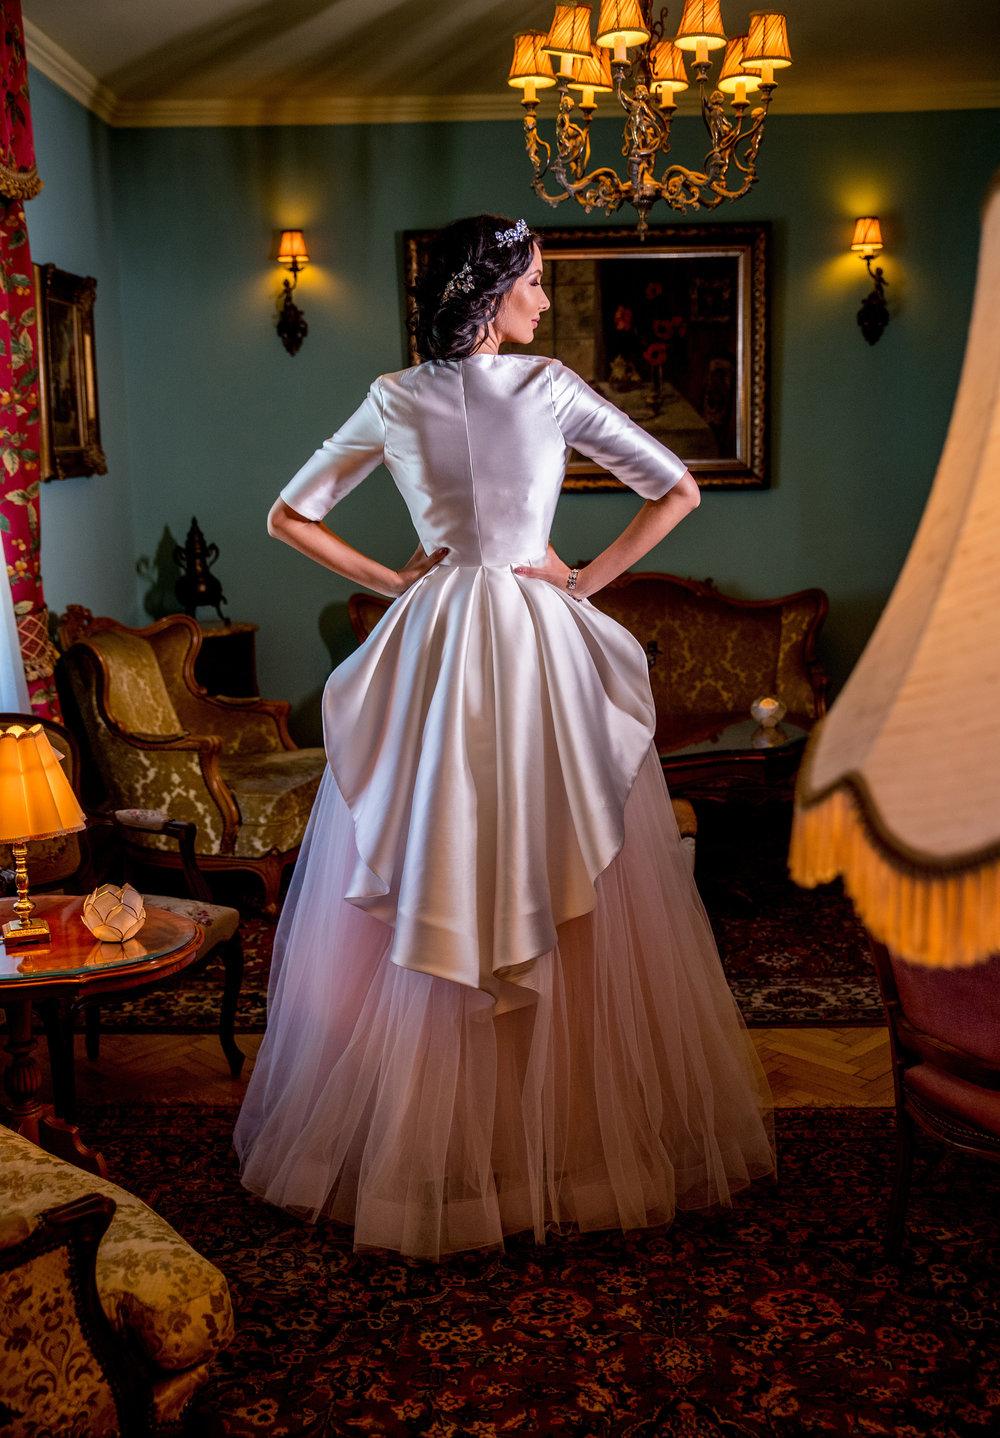 2018+Wedding+dress+Fashion+by+Laina+-+style+Balsamine-4.jpg